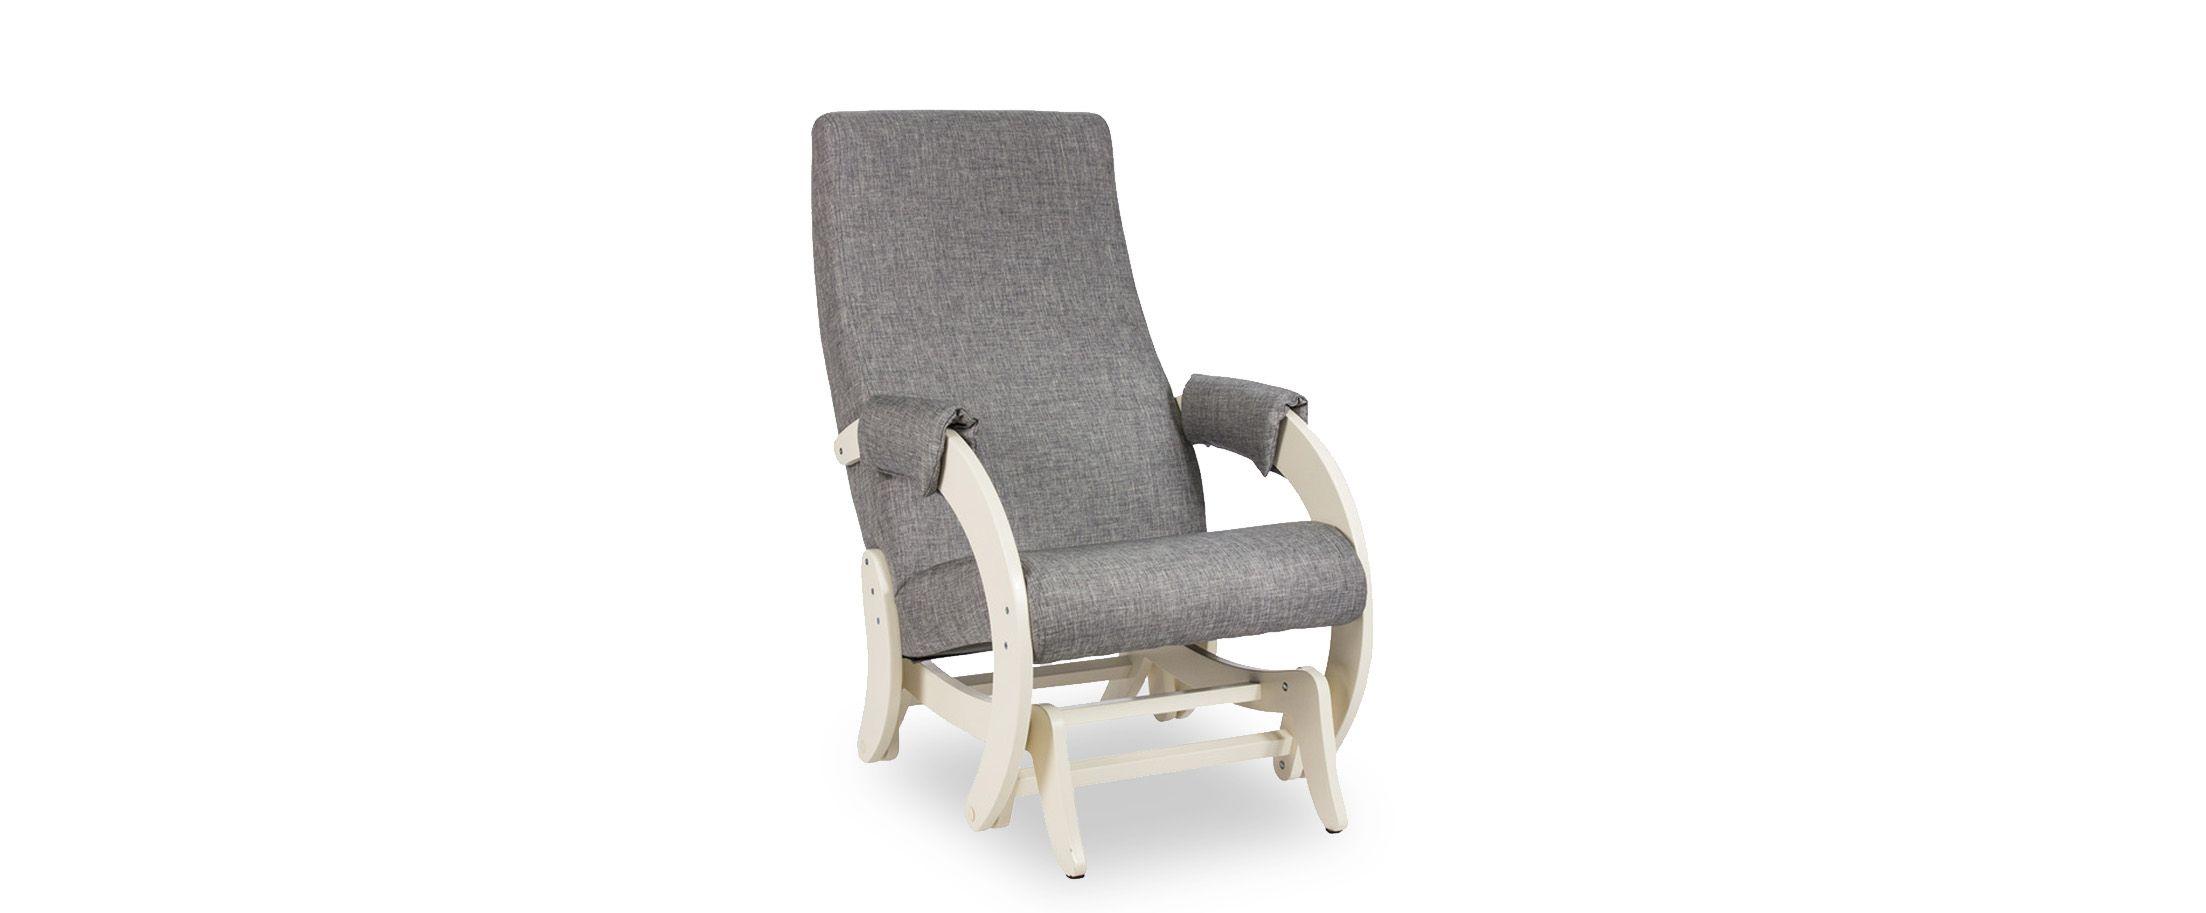 Кресло-гляйдер 68М FalconeLight от MOON TRADE